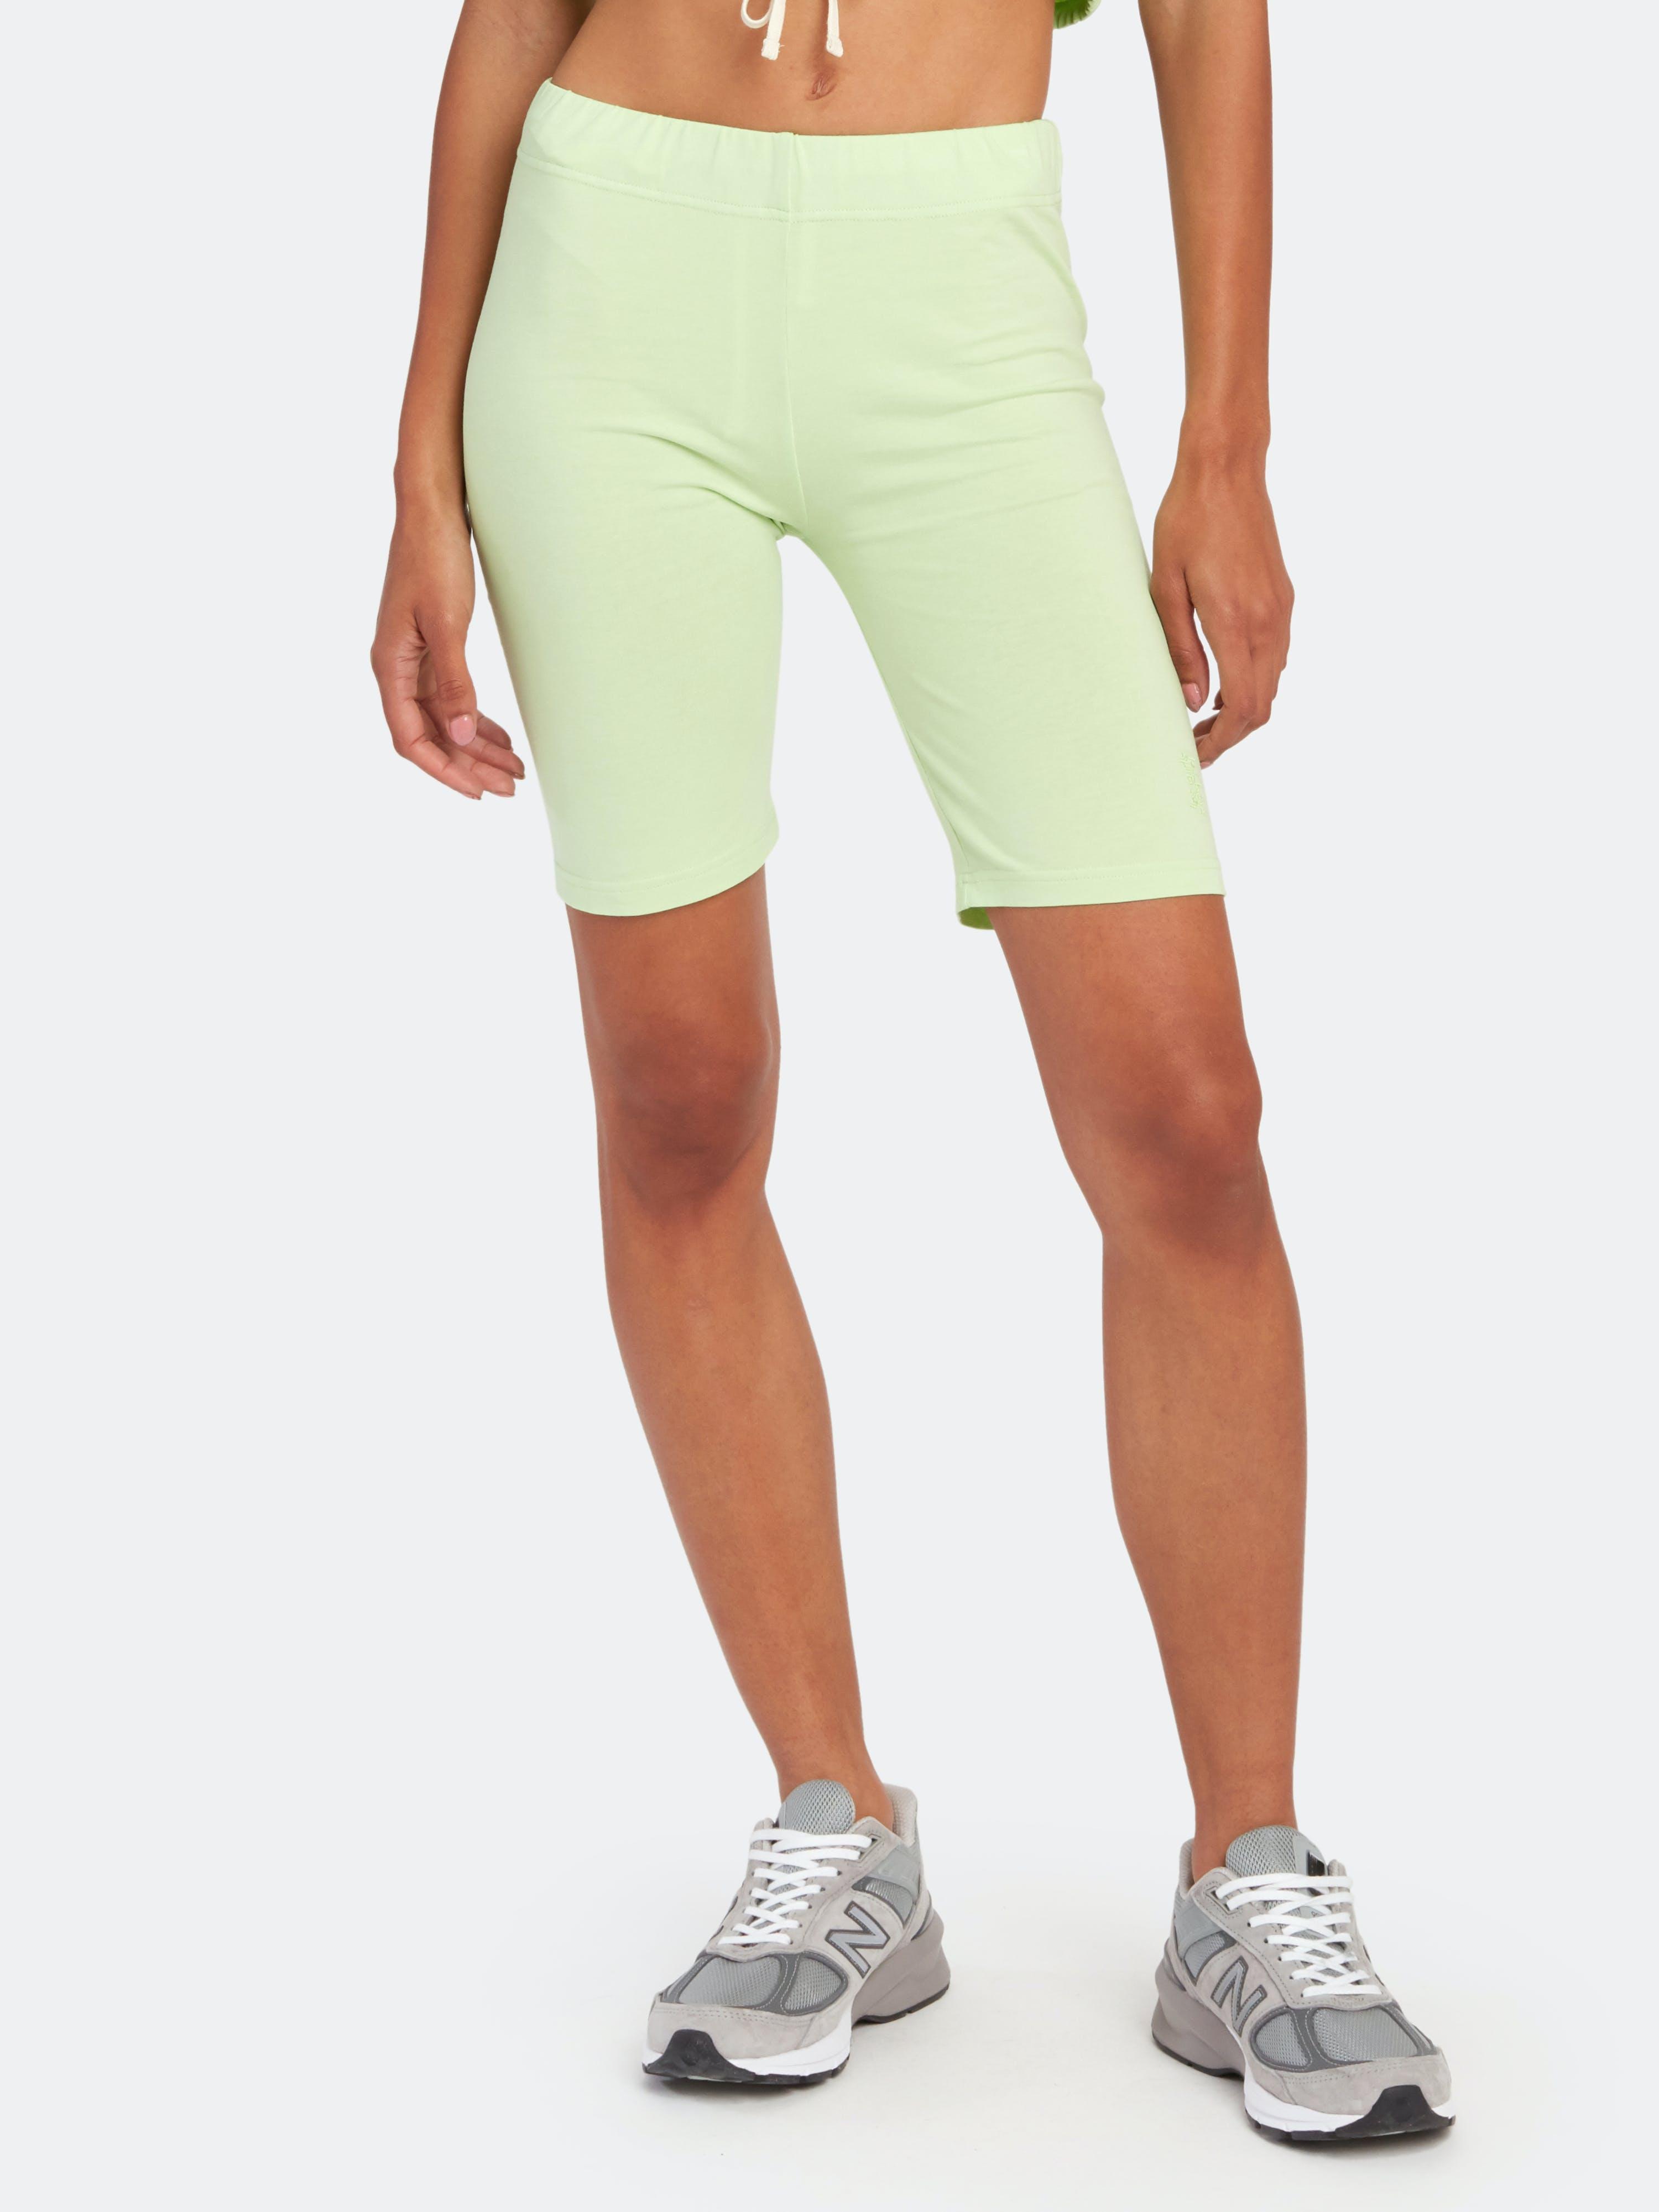 Les Girls Les Boys Tight Bike Shorts - XL - Also in: XS, M, L, S  - Green